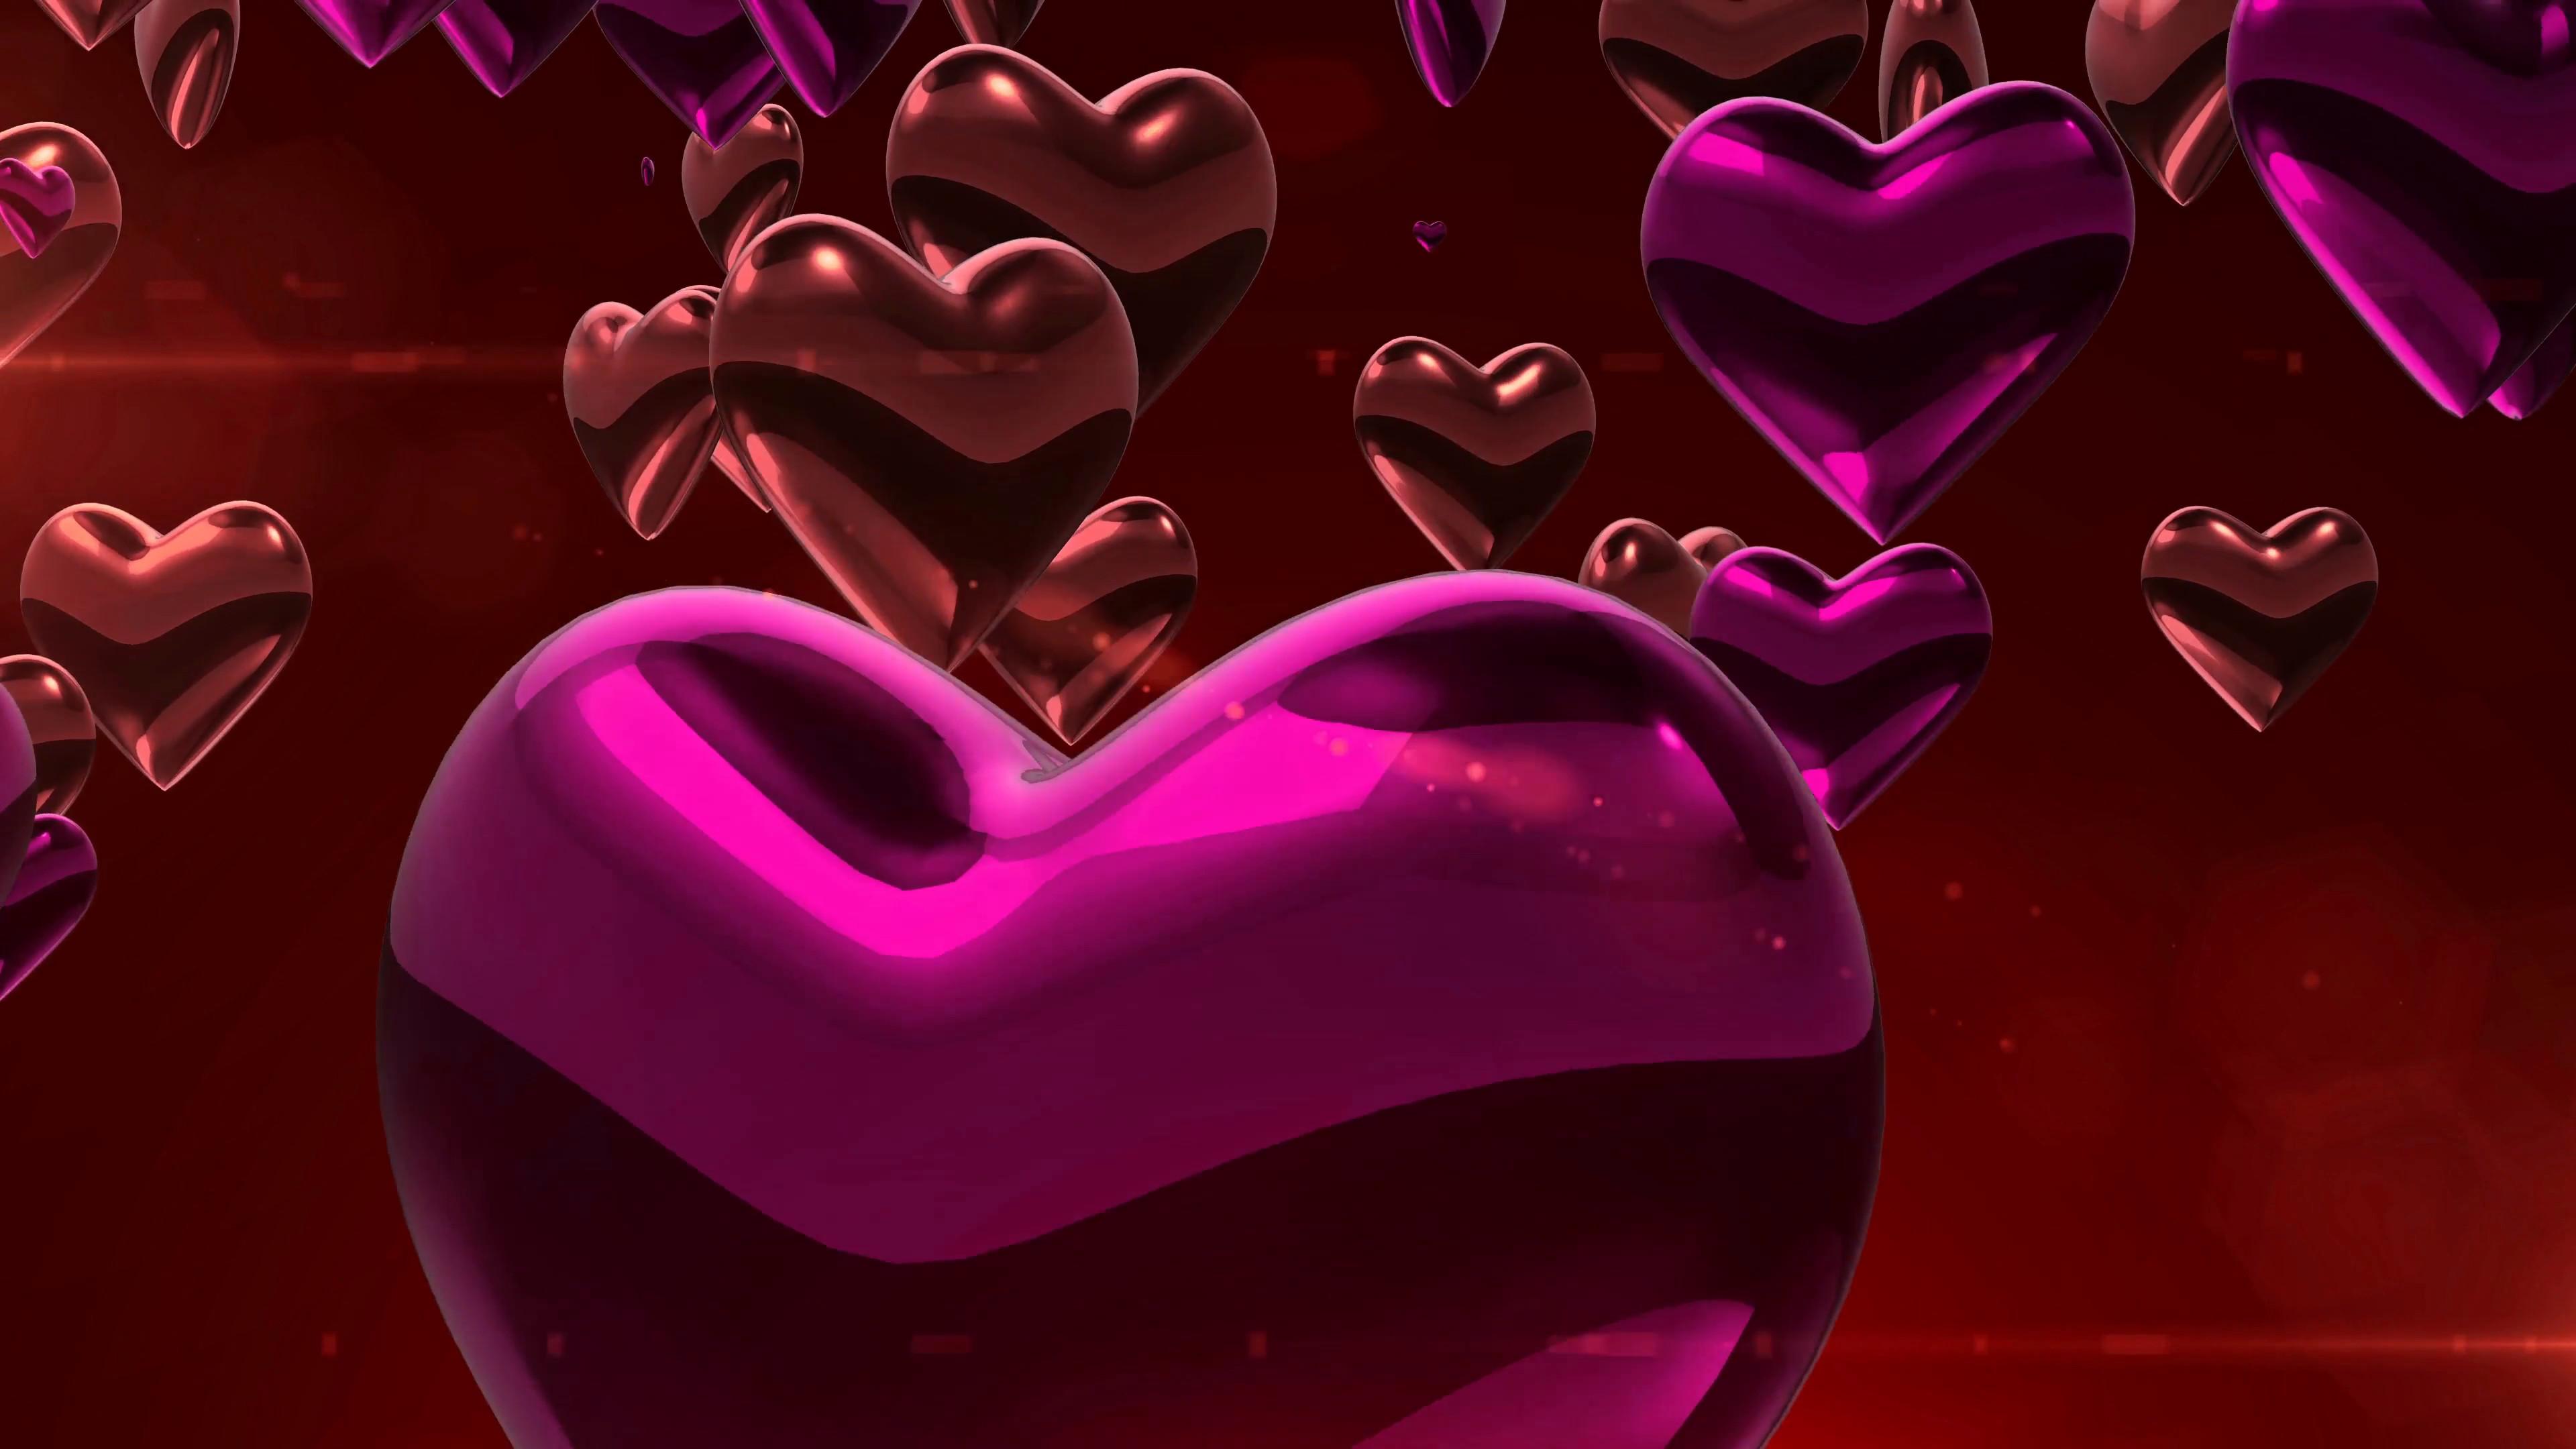 Purple hearts background 46 images 1920x1200 wallpapers backgrounds wallpapers purple hearts desktop background 1024x768 buycottarizona